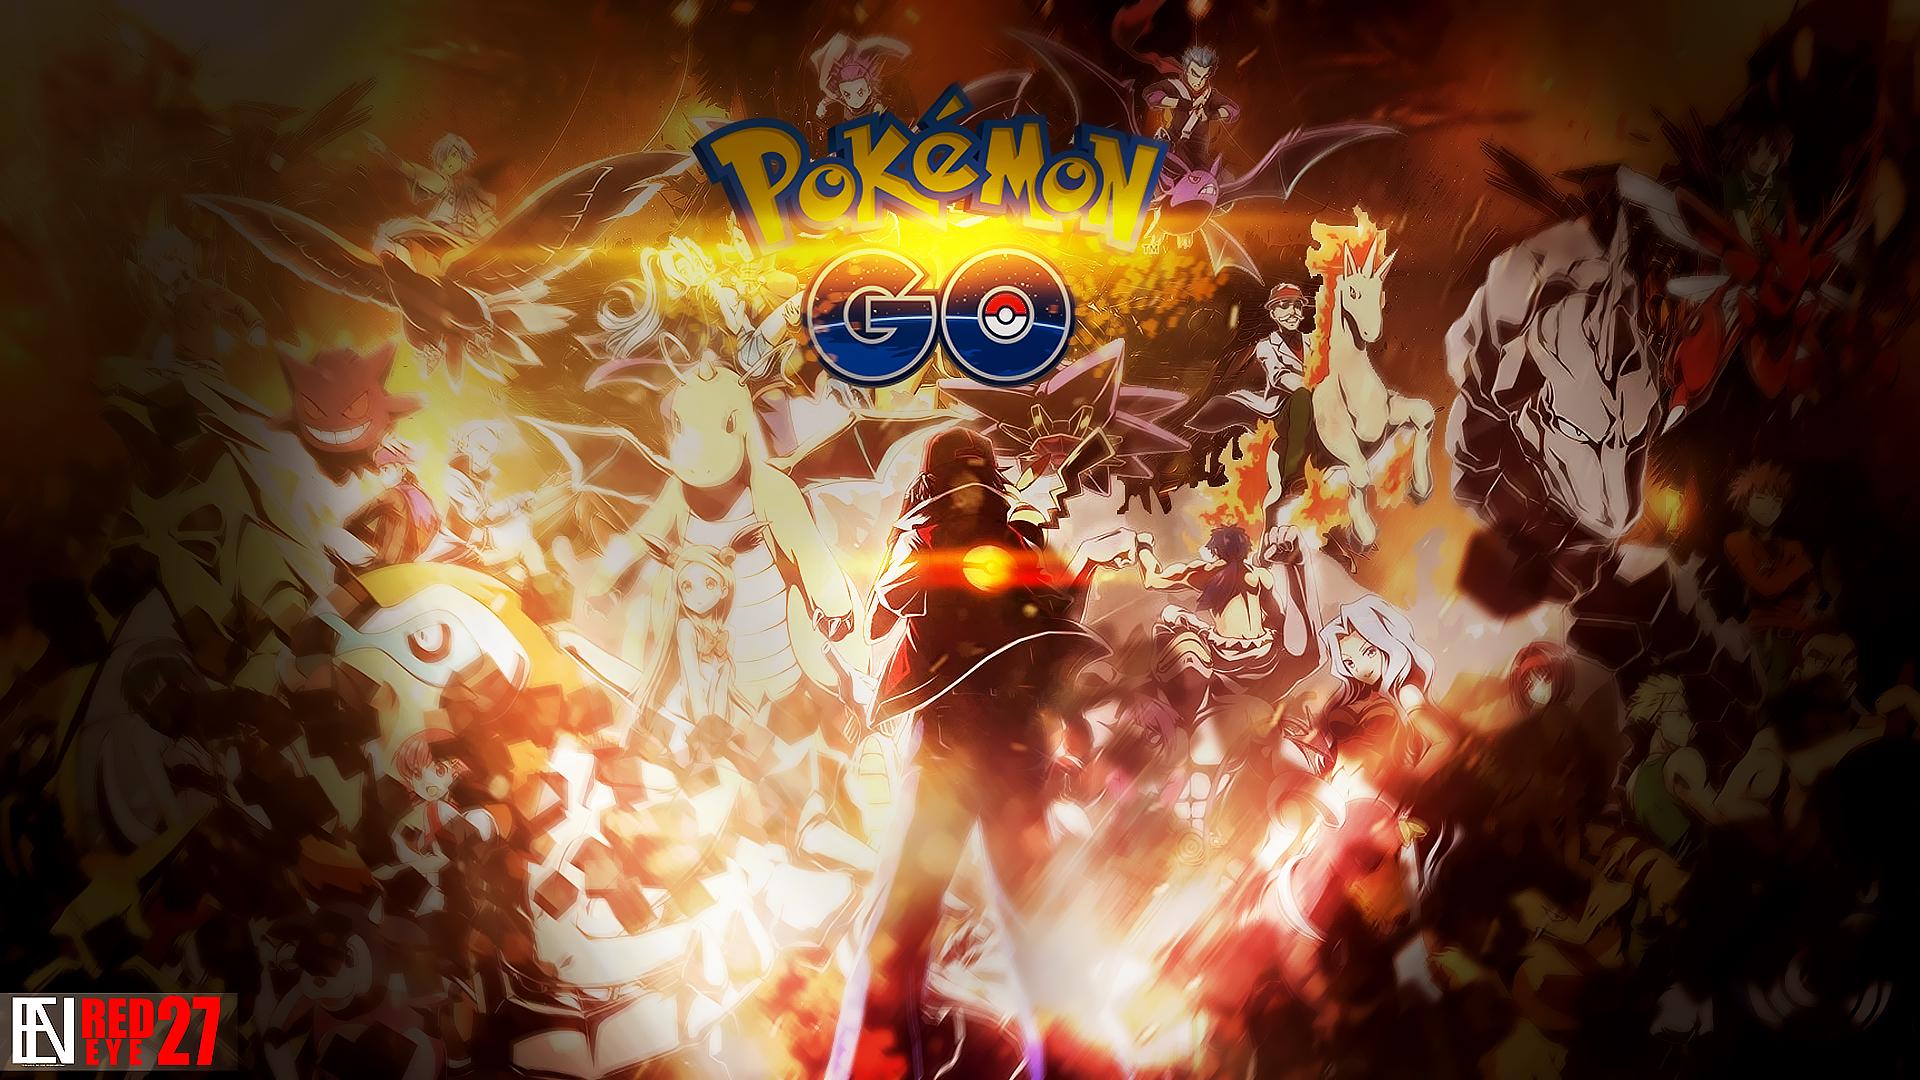 Pokemon Go Wallpaper By Redeye27 On DeviantArt